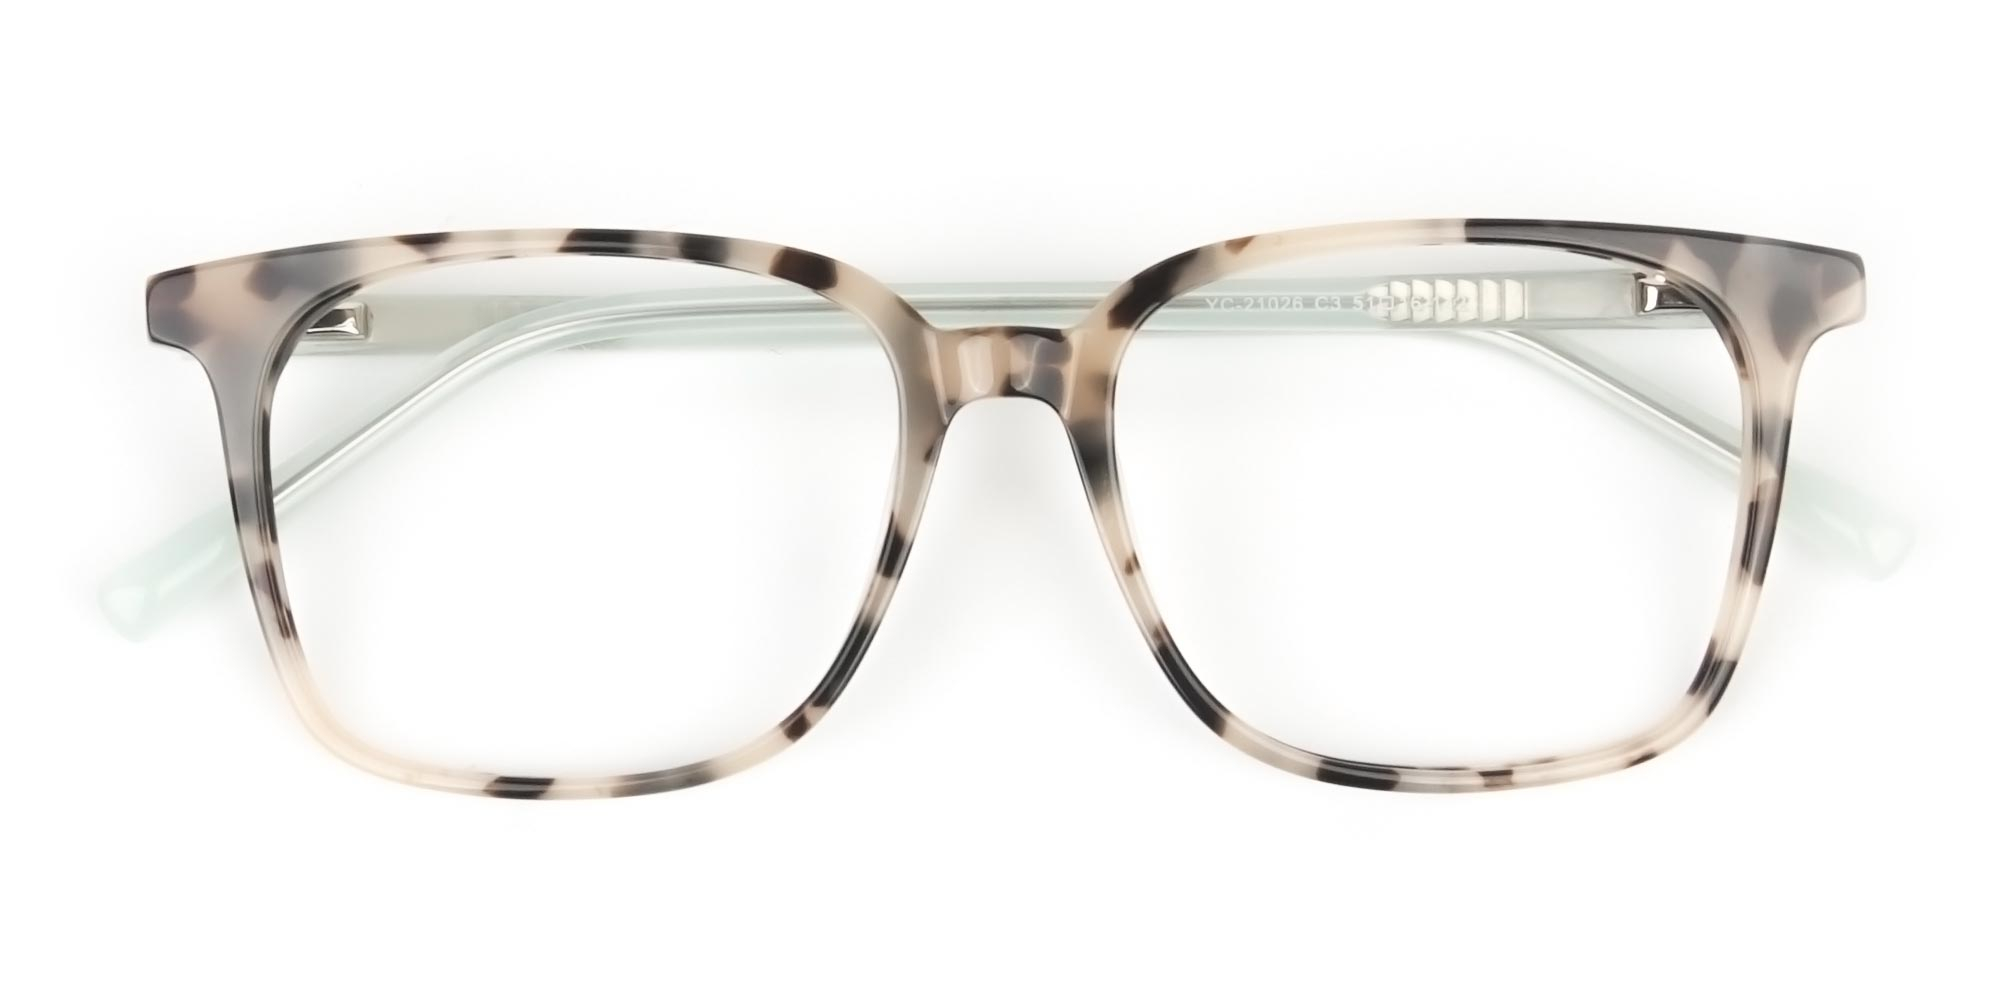 Oversized Glasses in Creamy Tortoiseshell